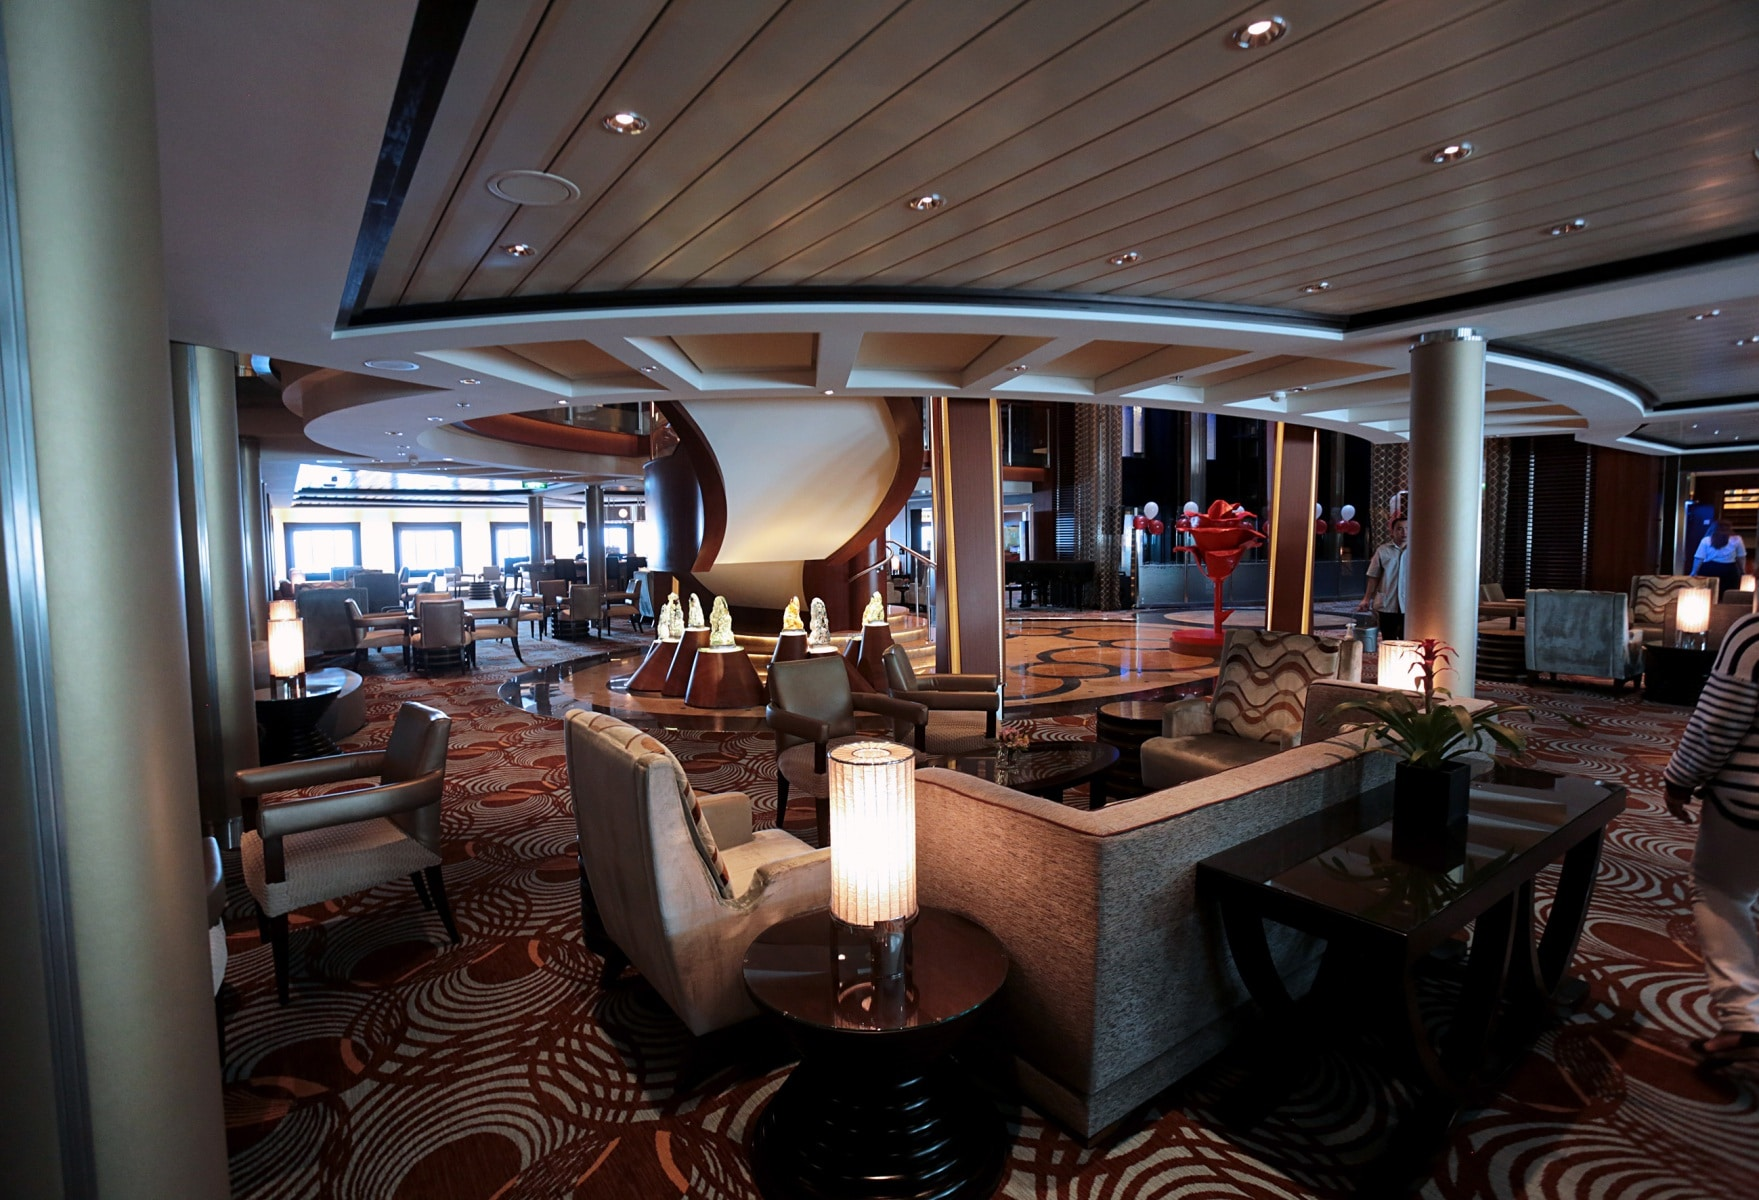 08-may-2017-25visita-inaugural-del-crucero-celebrity-or-reflection-a-gibraltar_33895390984_o